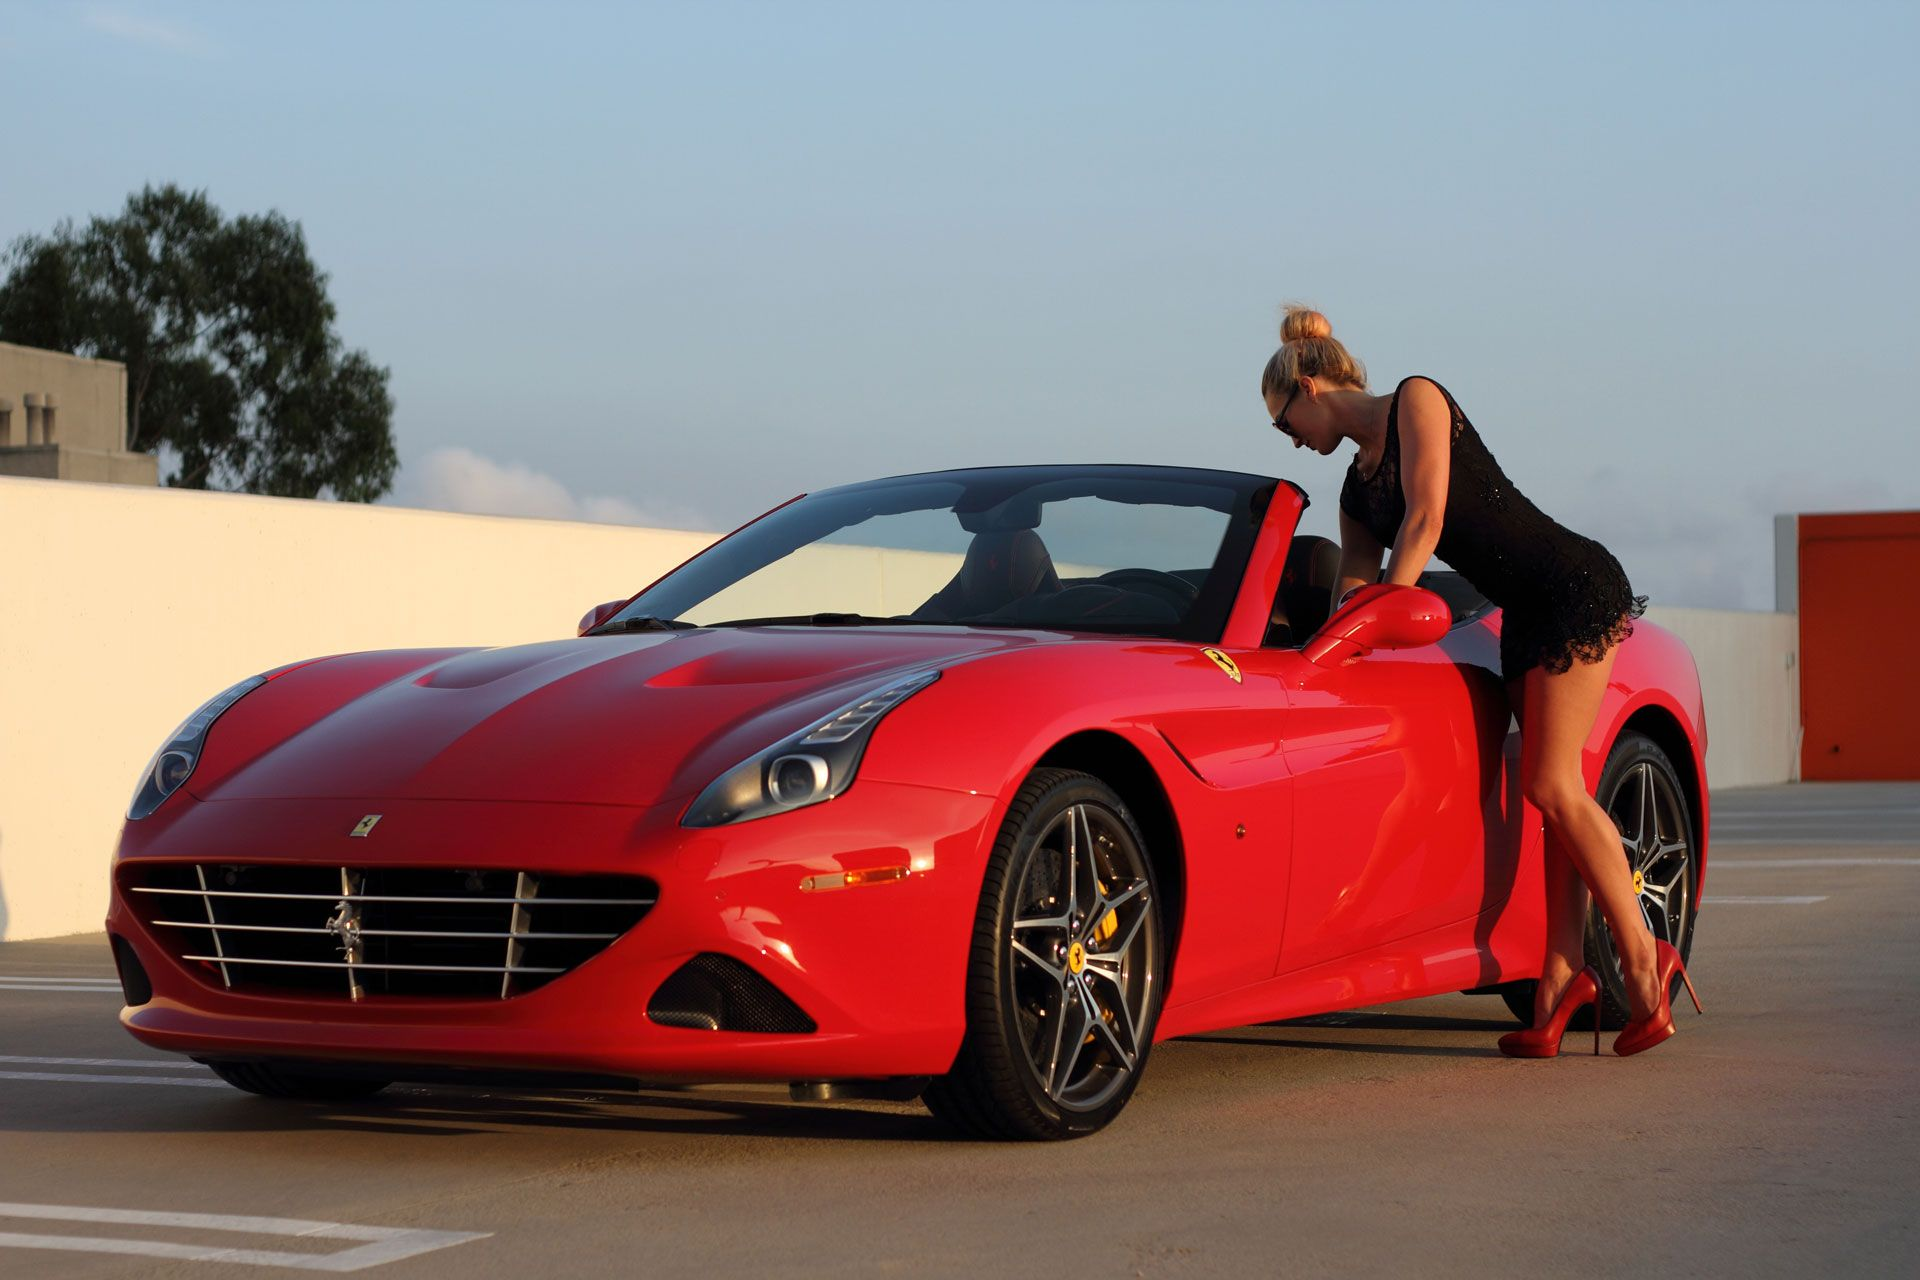 sport rome car rent rental luxury ferrari hire speciale aaa new